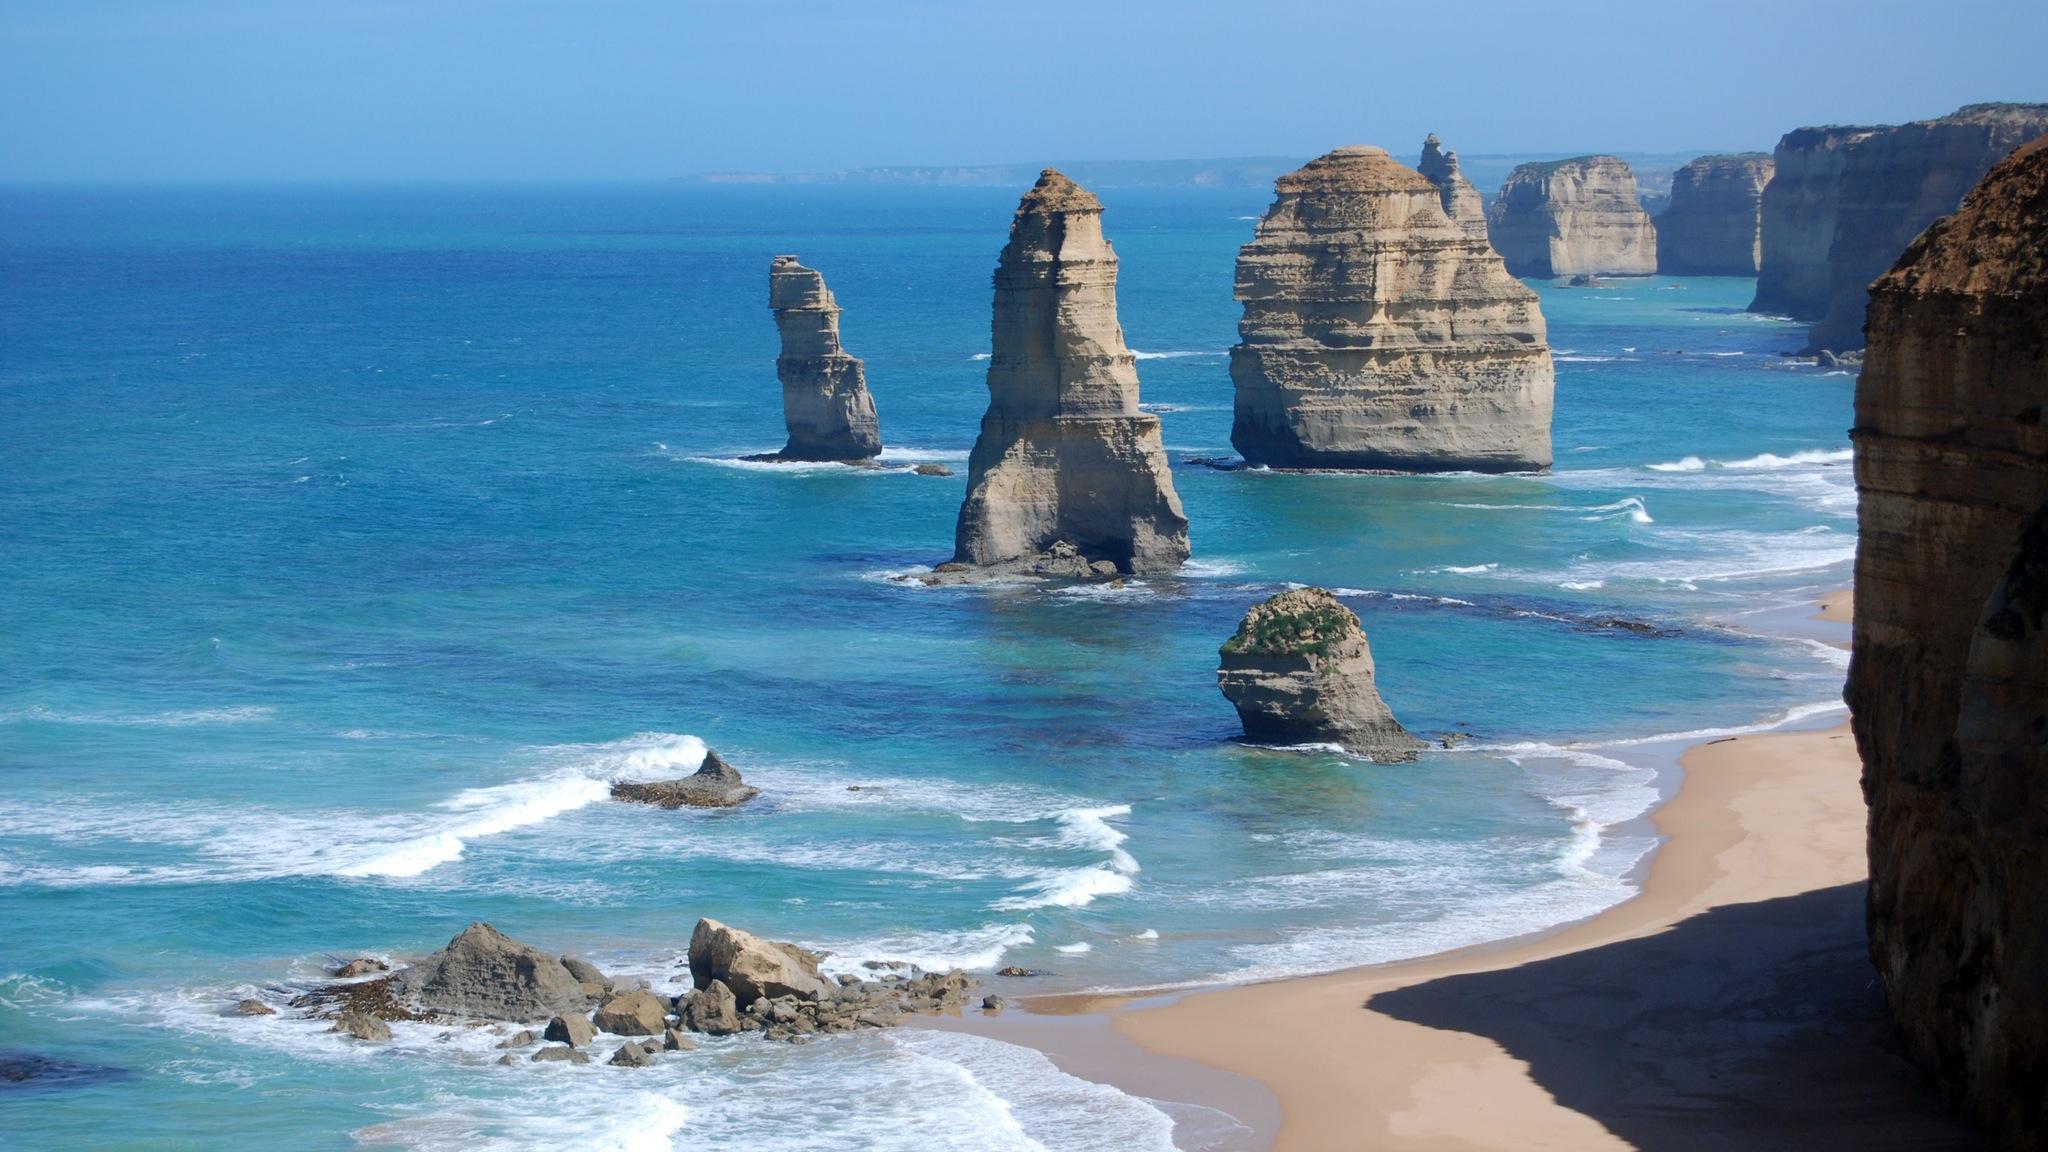 Iconic 12 Apostles Great Ocean Road